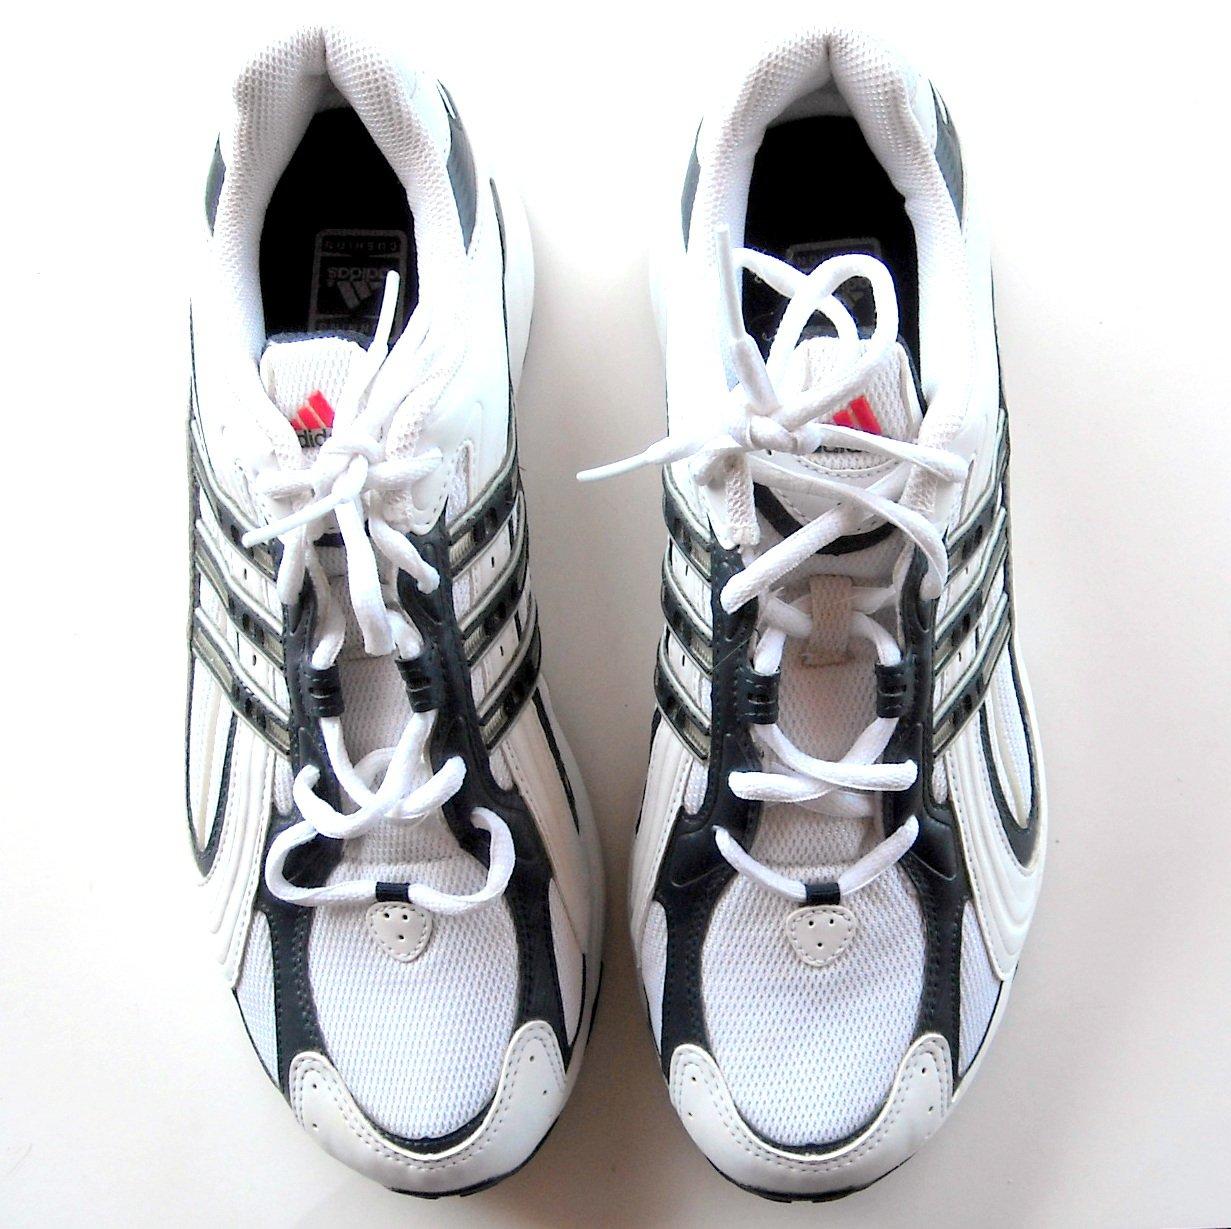 Adidas Adiprene Originals White Running Shoes Size 9.5 US